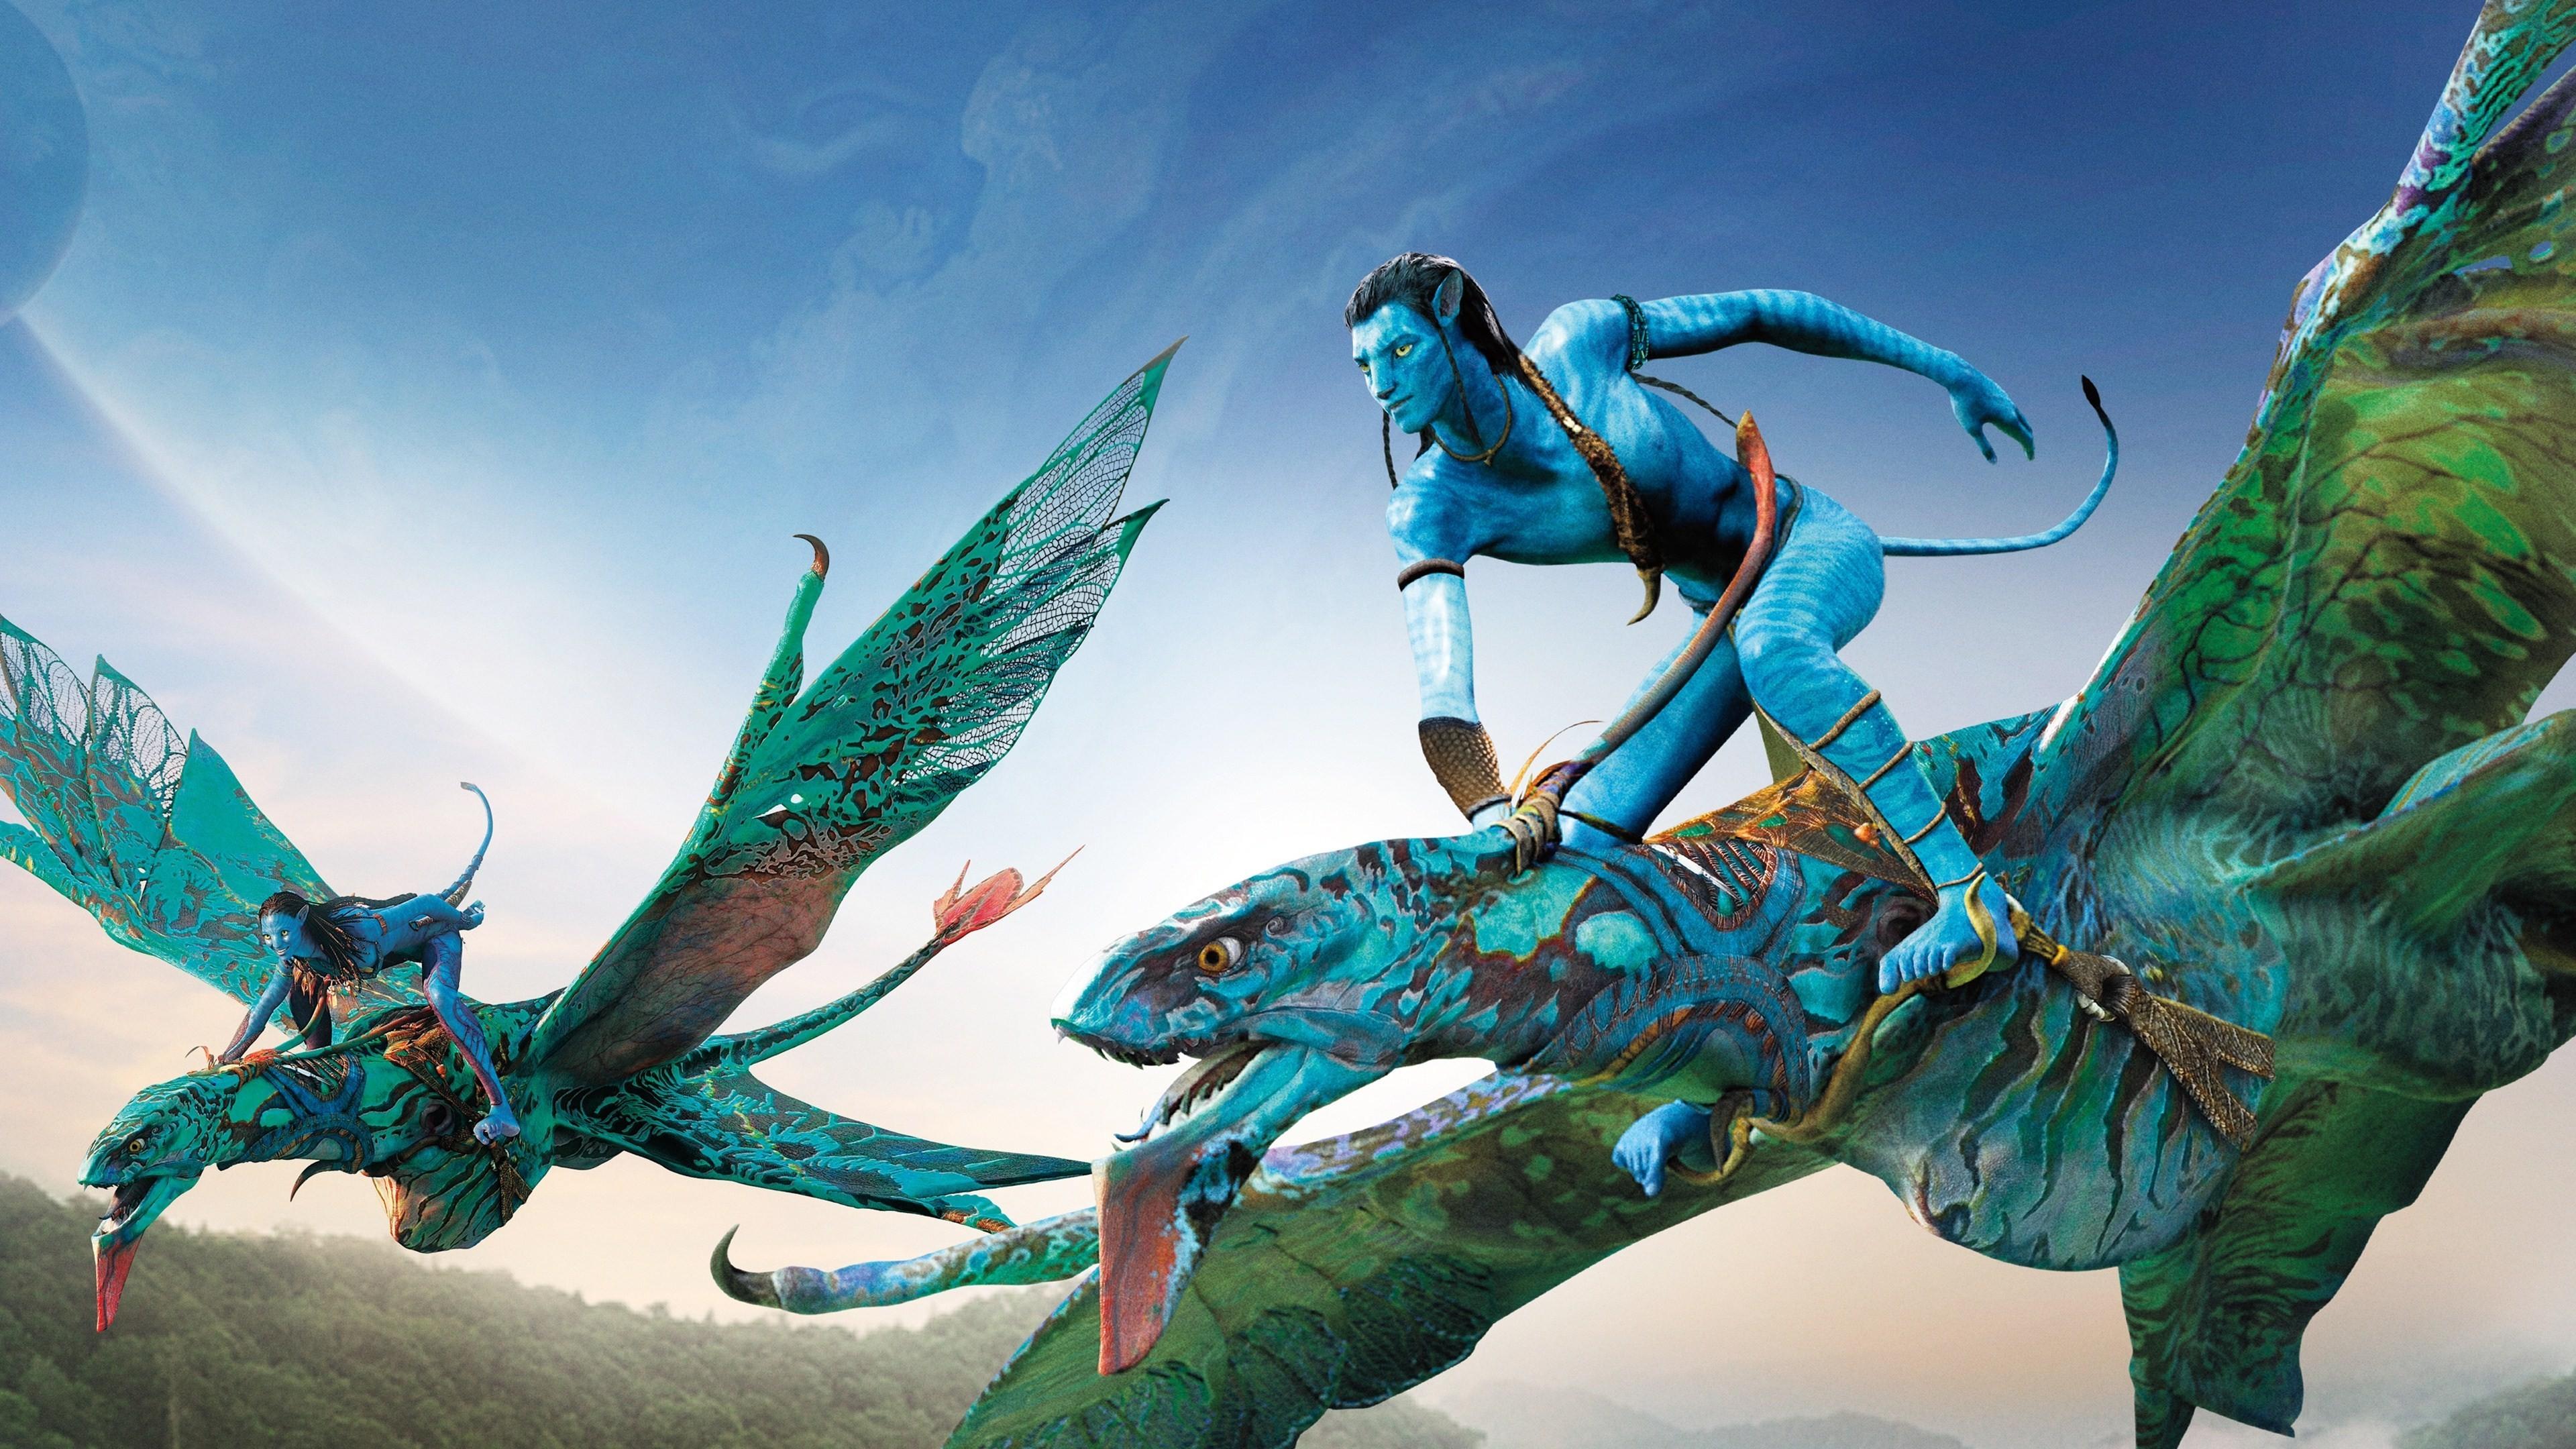 Fond Décran 3d Dragon Avatar Jake Sully Neytiri